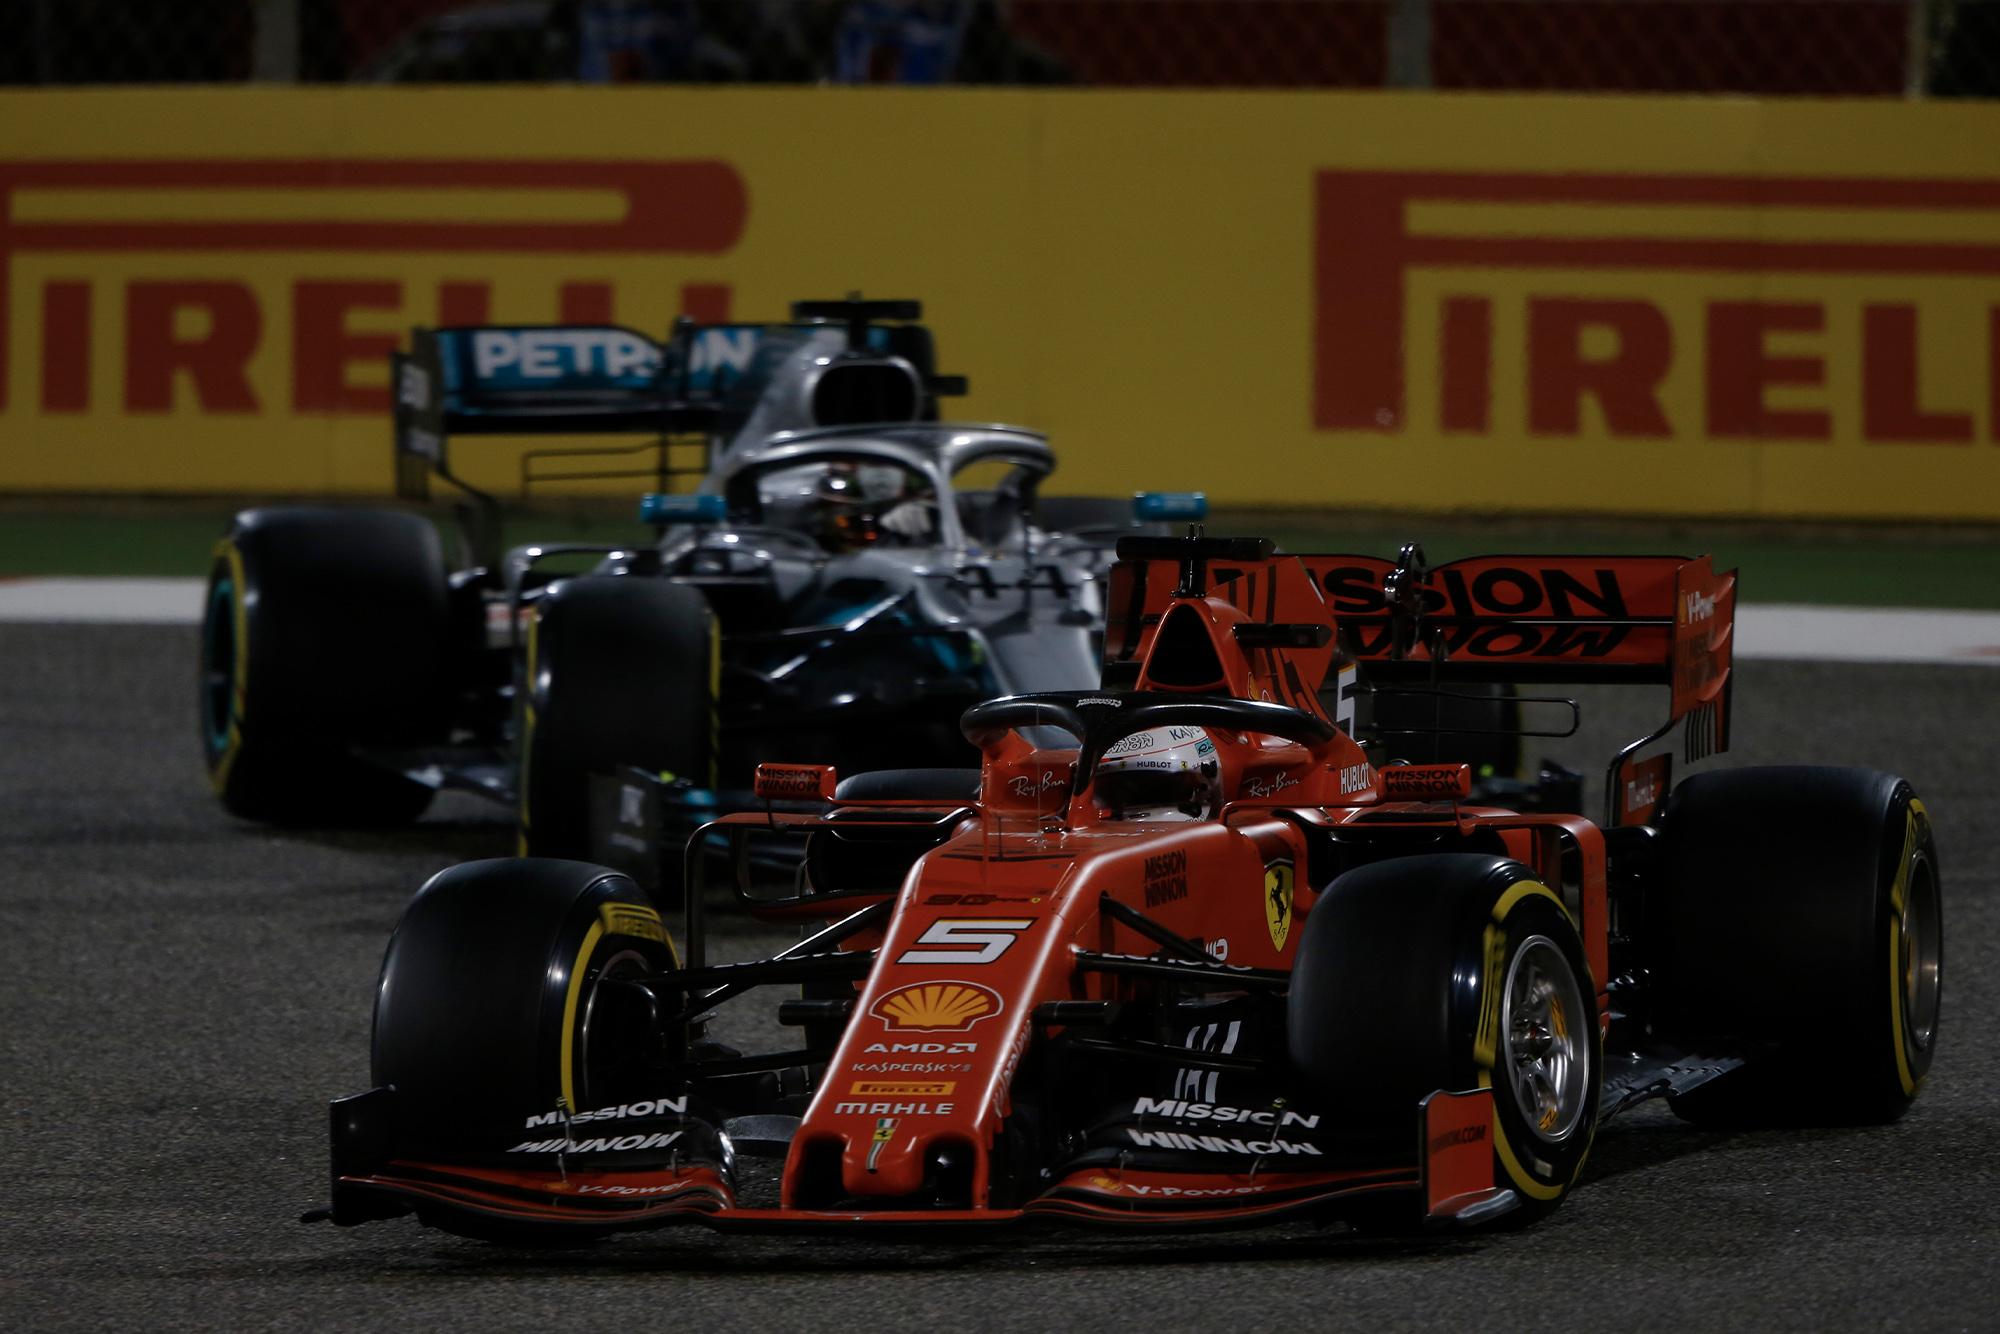 Sebastian Vettel and Lewis Hamilton during the Bahrain Grand Prix